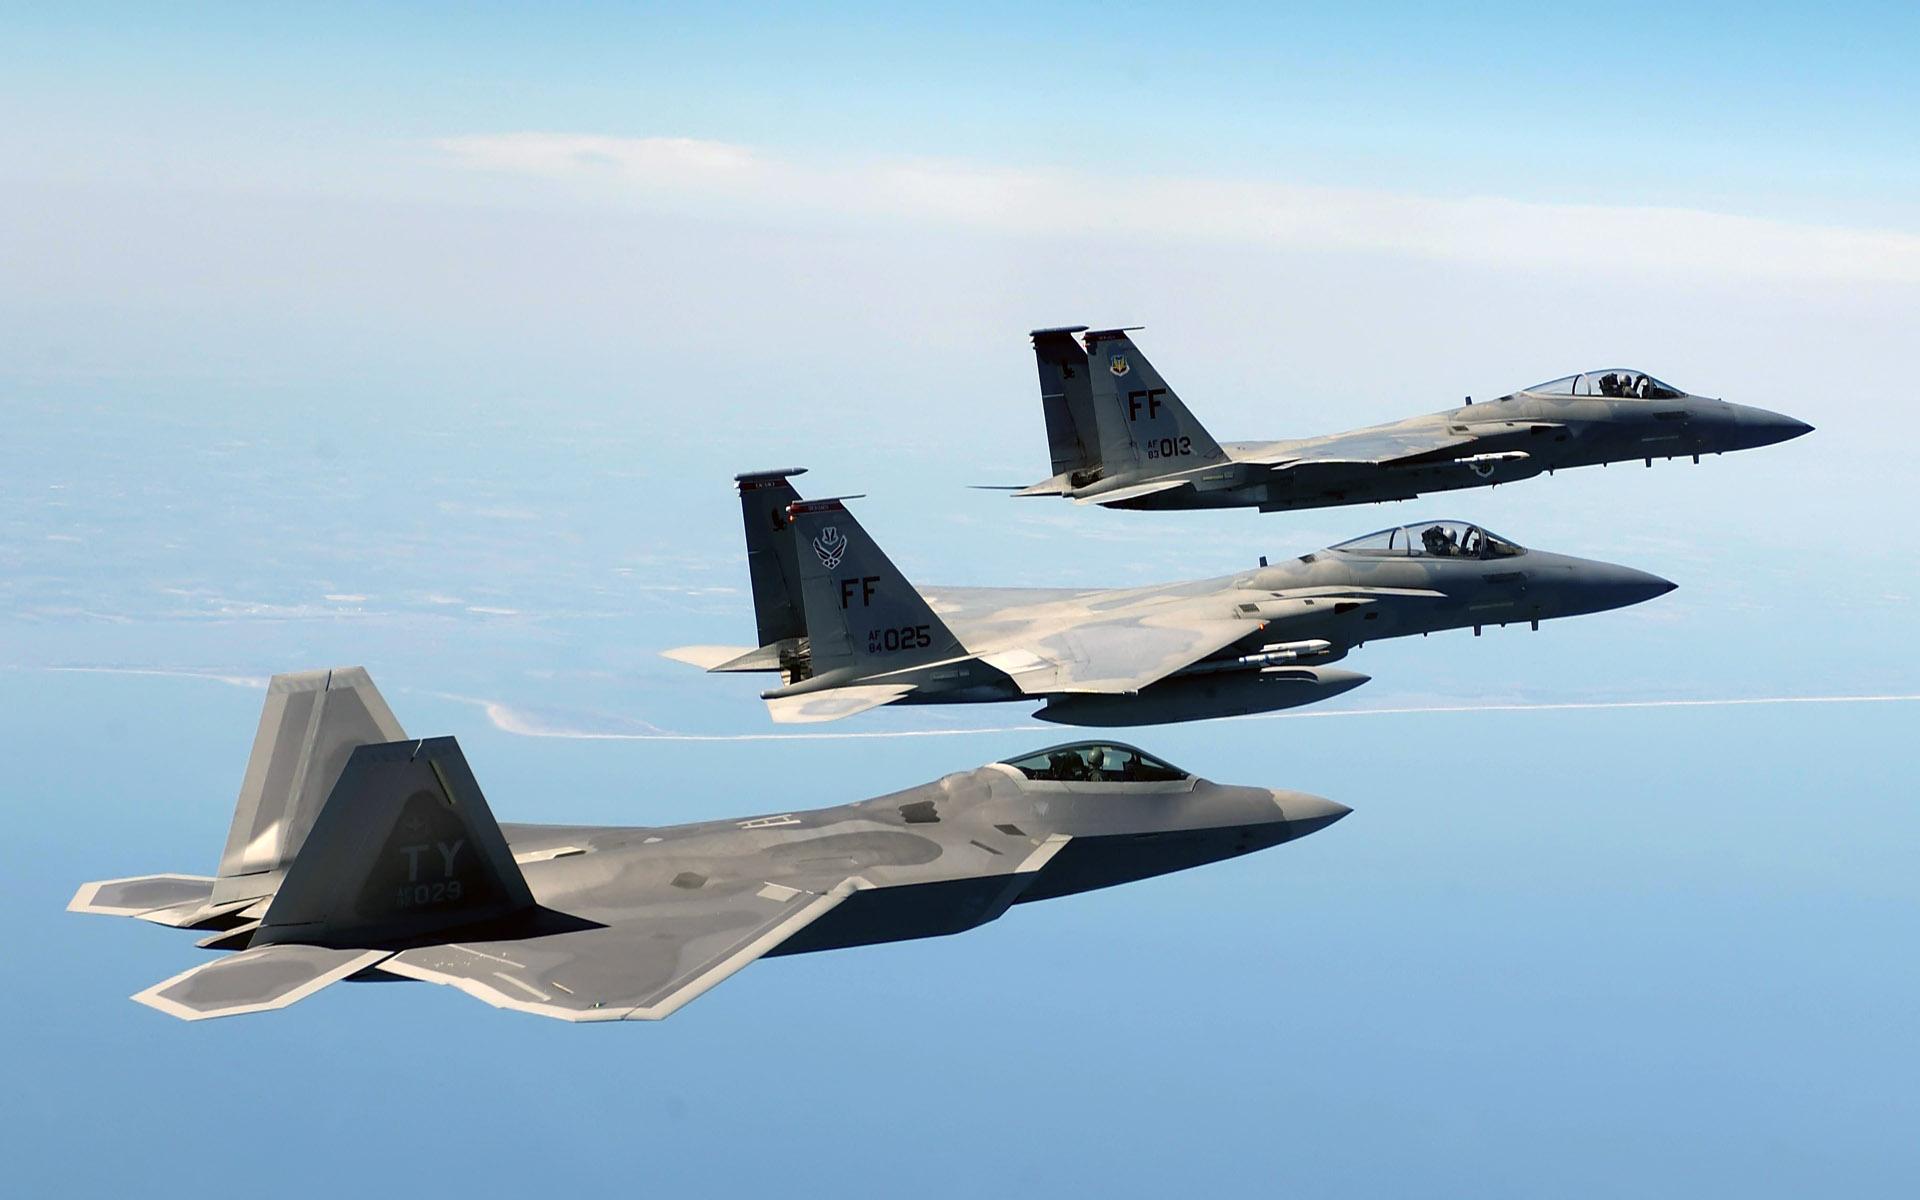 Aircrafts F 22 Wallpaper 1920x1200 Aircrafts F22 Raptor F15 Eagle 1920x1200